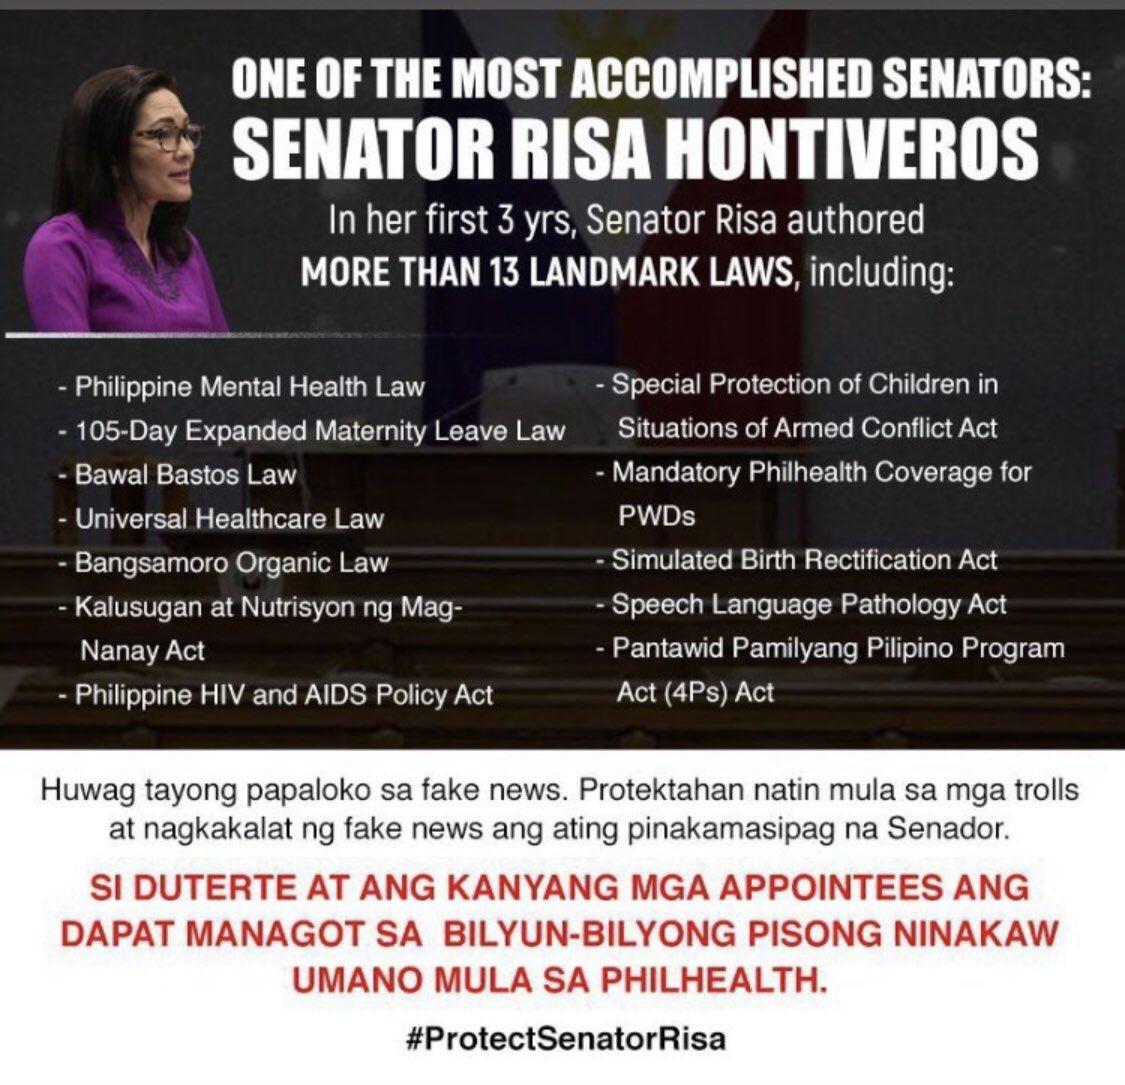 A favourite target of Fake News. But my Senator will not stand down. @risahontiveros @PinoyAkoBlog @macoydubs1 @hecklerforever8  #ProtectSenatorRisa #NotoAntiTerrorLaw #NOtoABSCBNFranchiseDenial #NoToDeathPenalty #YestoMassTesting  #PandemyaAngKalabanHindiMamamayanpic.twitter.com/4EF1wIGc81